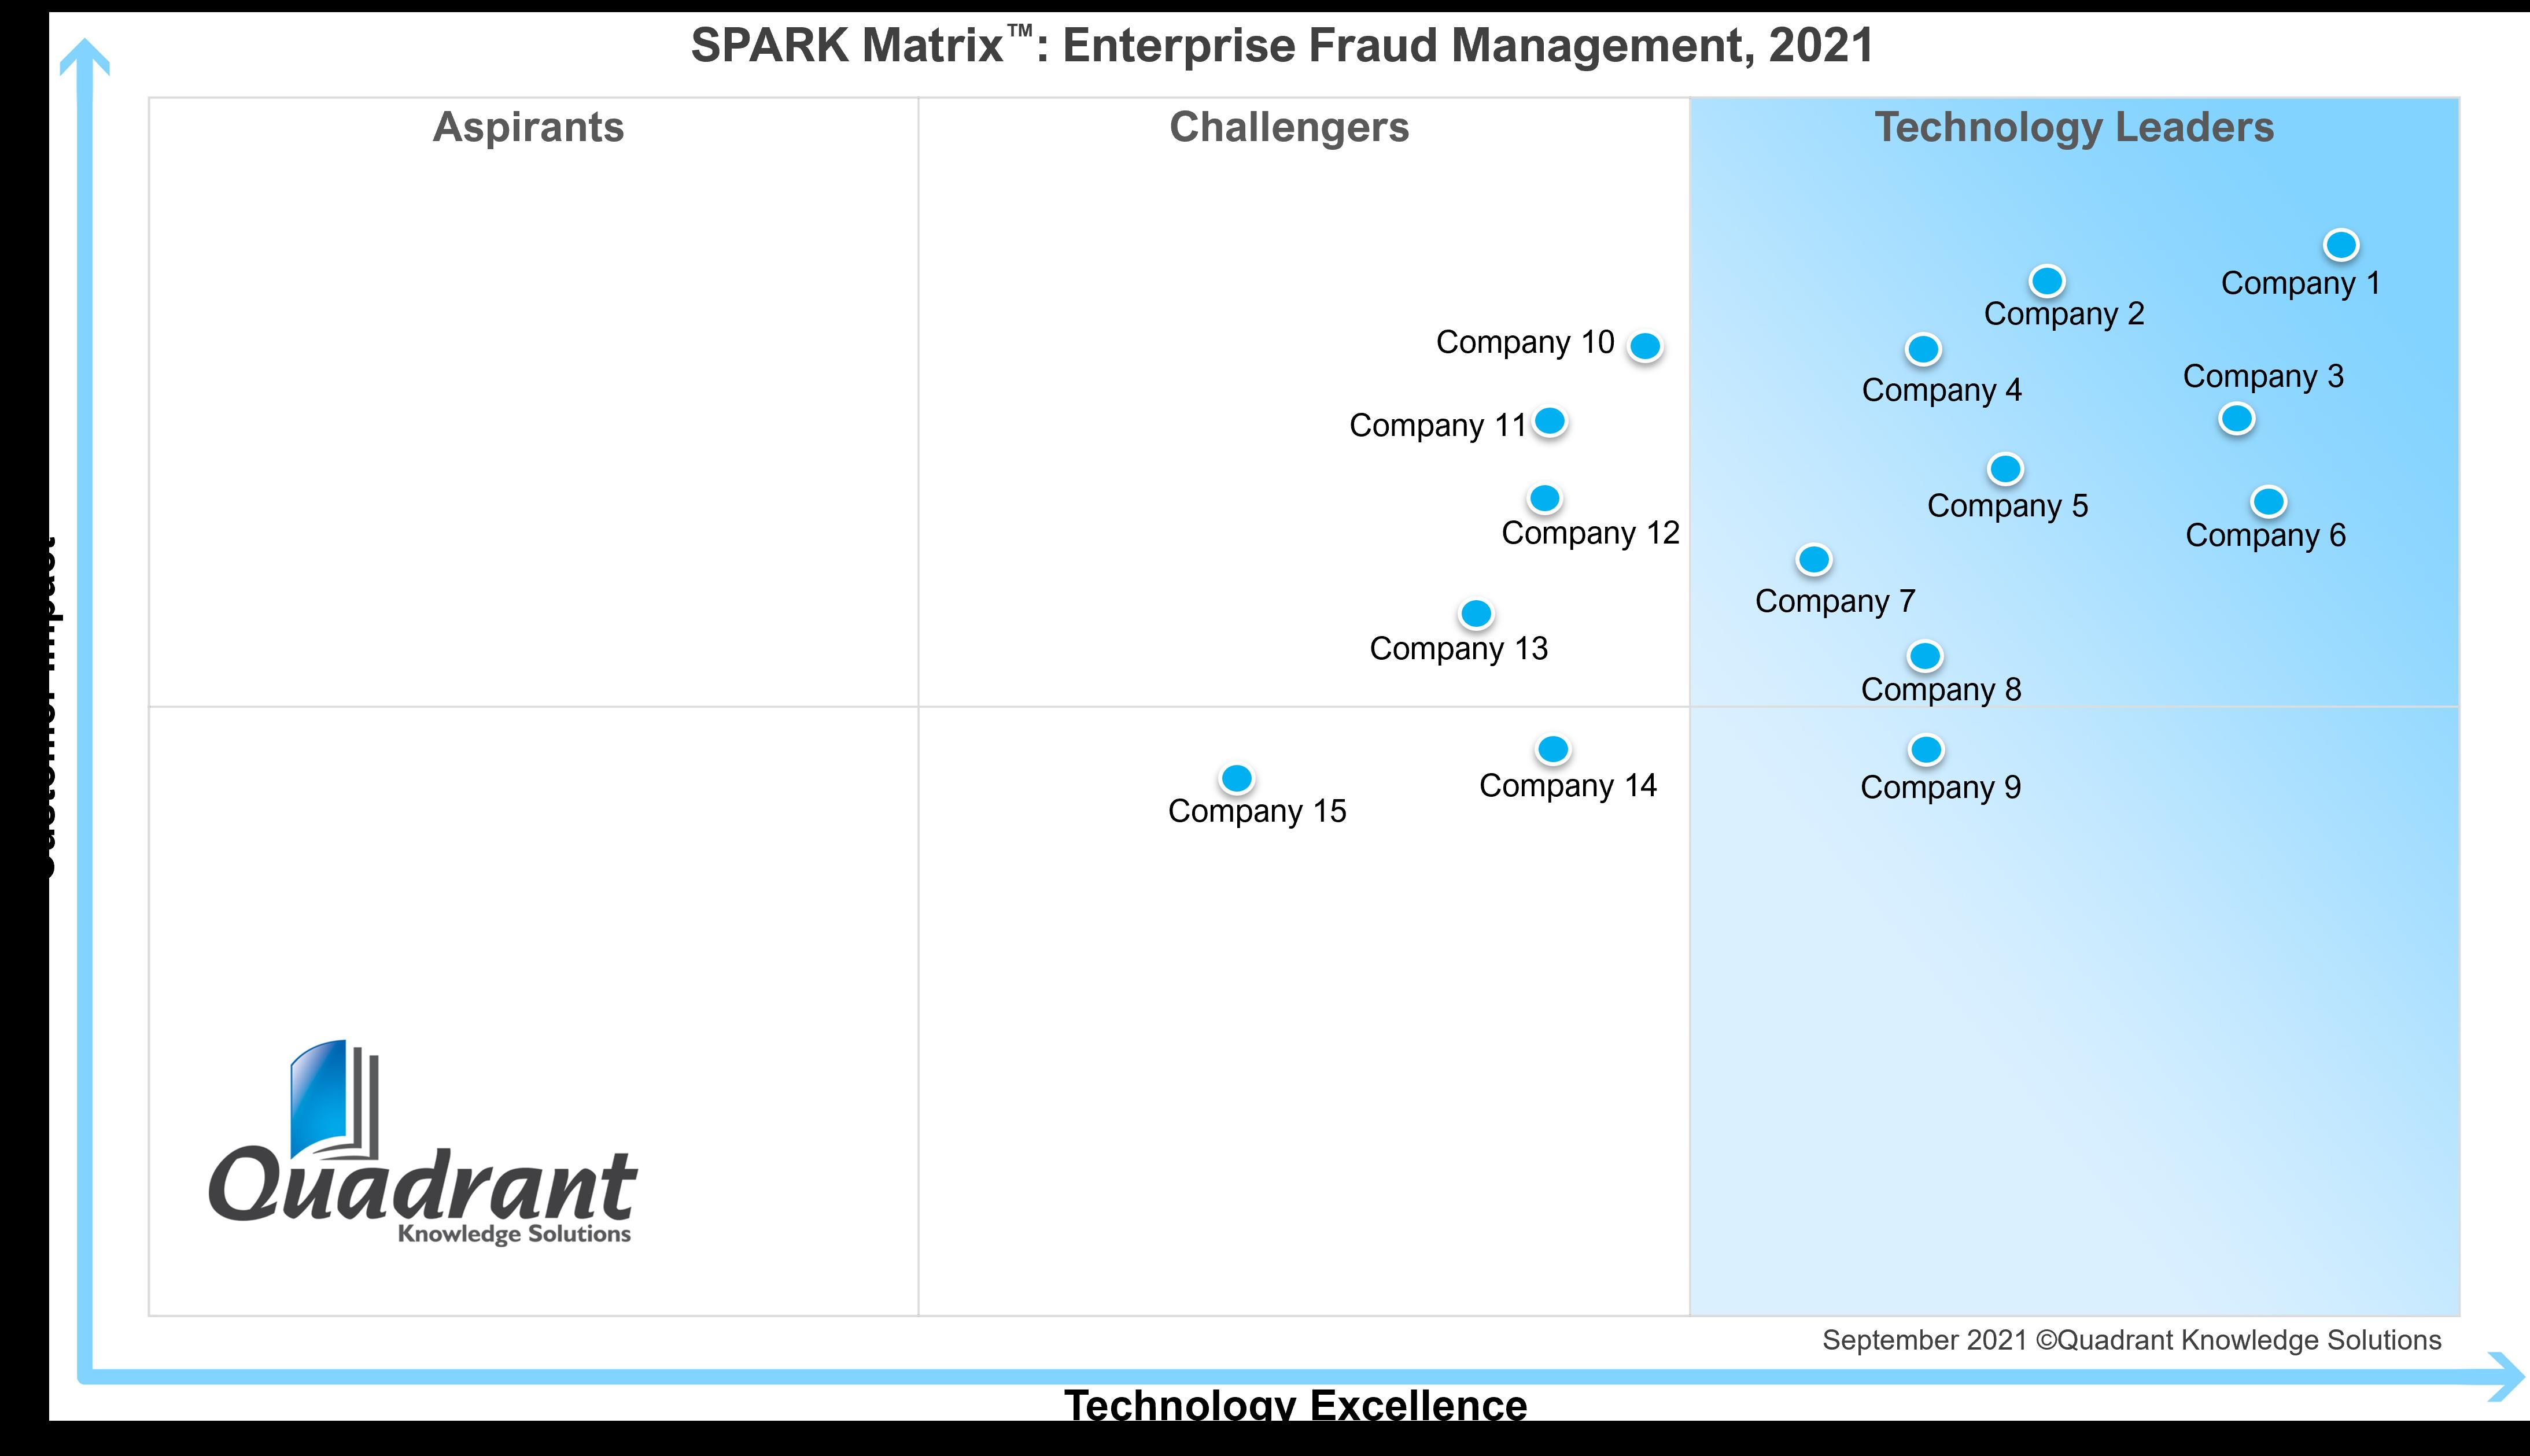 Enterprise Fraud Management, 2021